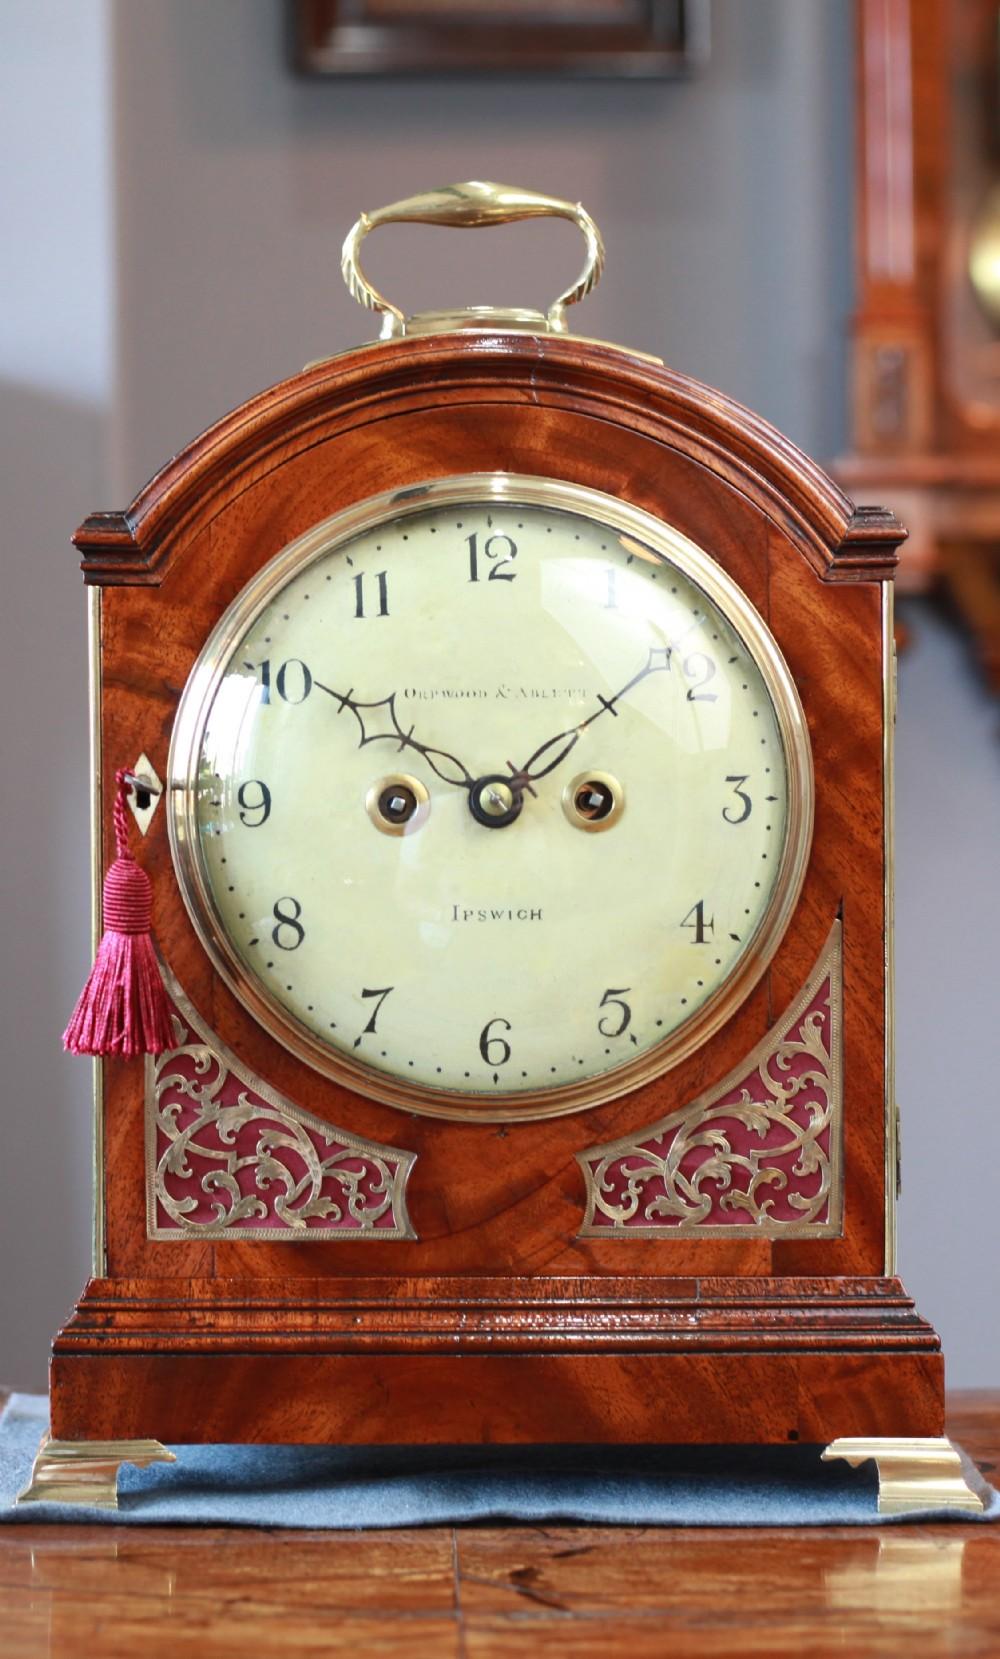 c1820 stunning regency mahogany striking pad top fusee bracket clock by orpwood and ablett of ipswich